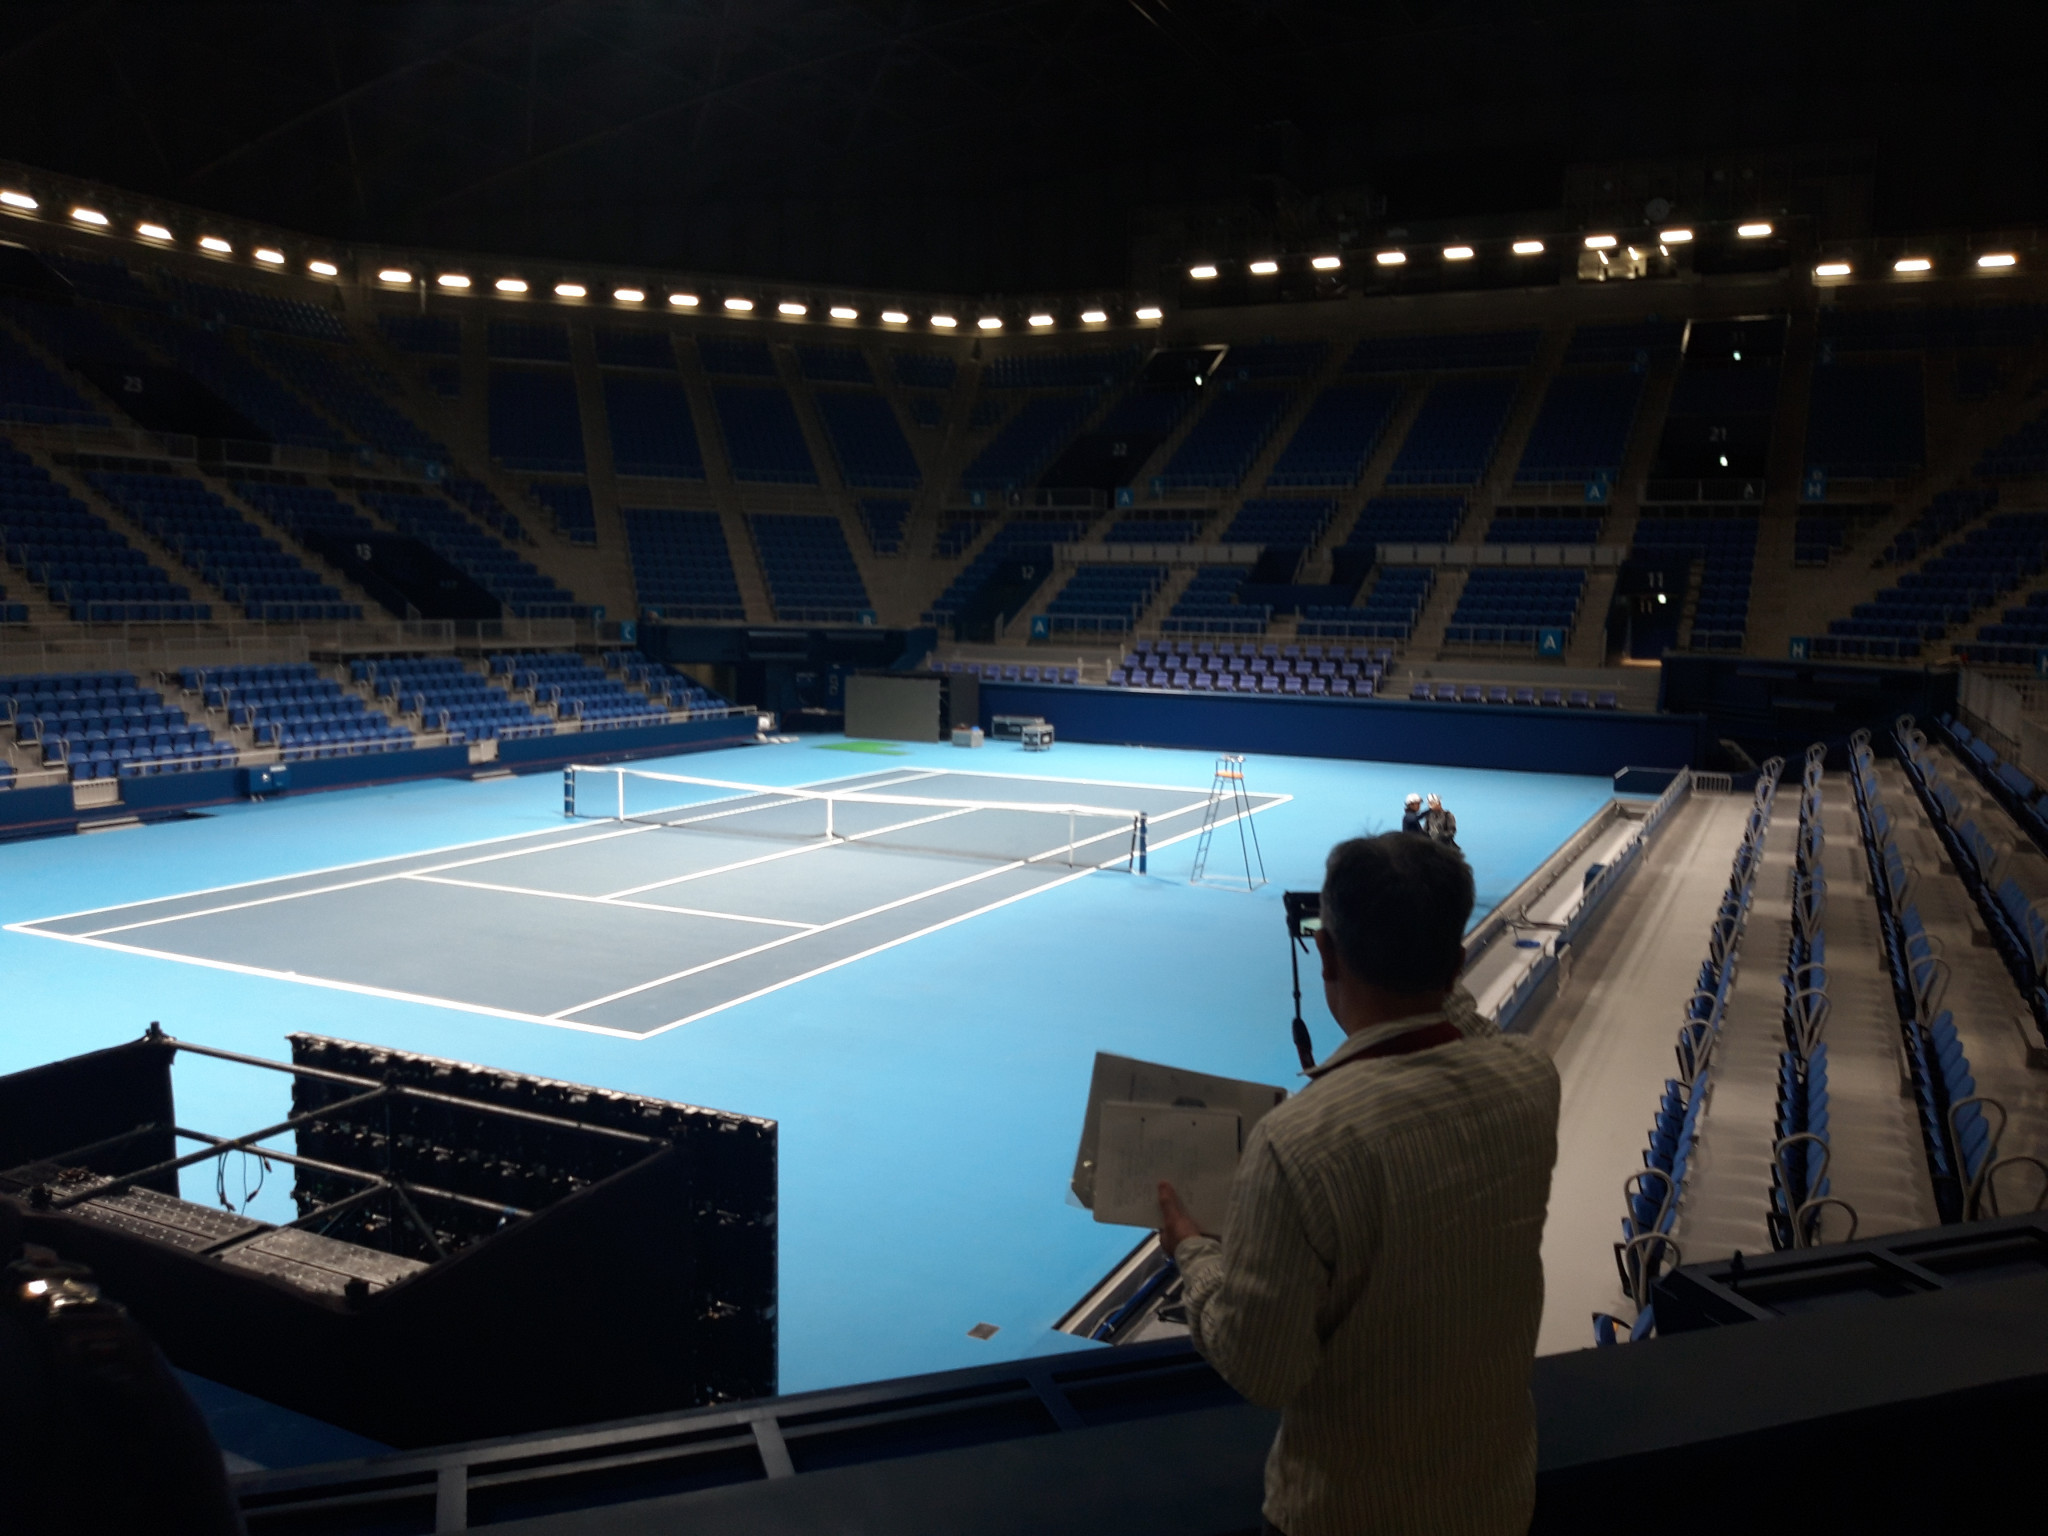 Ariake Colosseum in Ariake Tennis Park hosted the Rakuten Japan Open at the start of October ©ITG